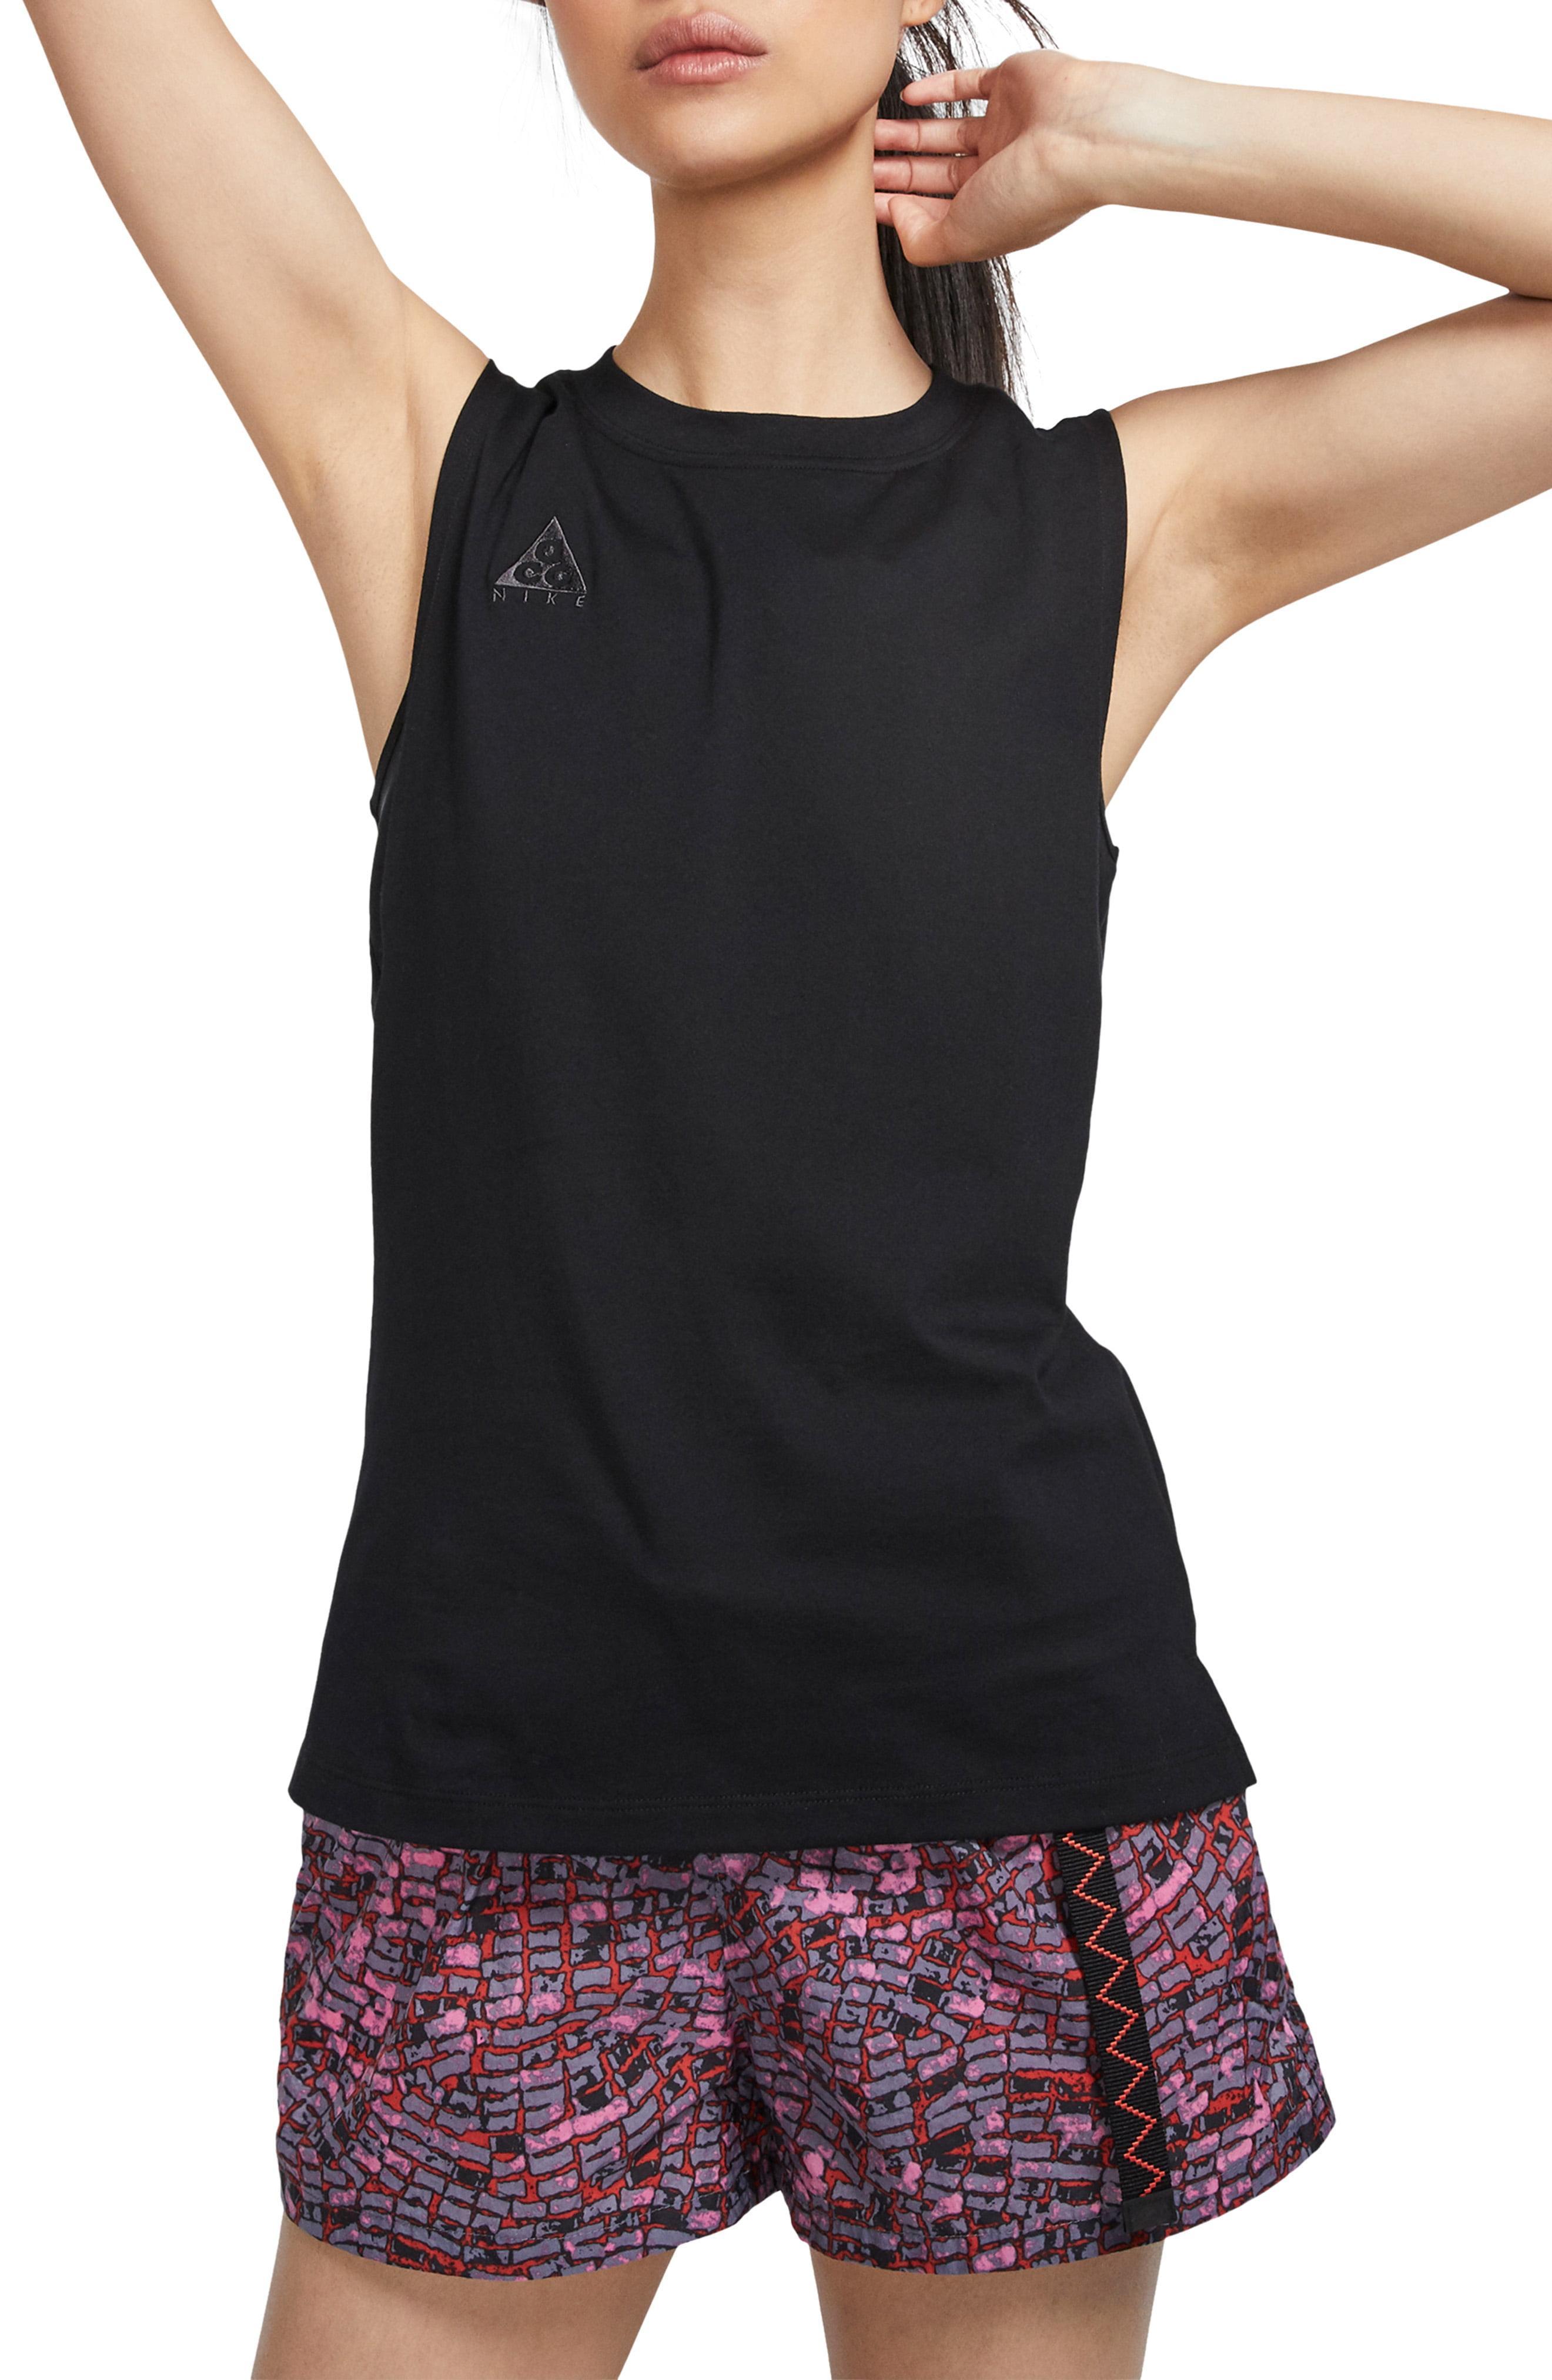 cheap for discount dbfdb 93d66 Nike. Black Acg Women s Tank